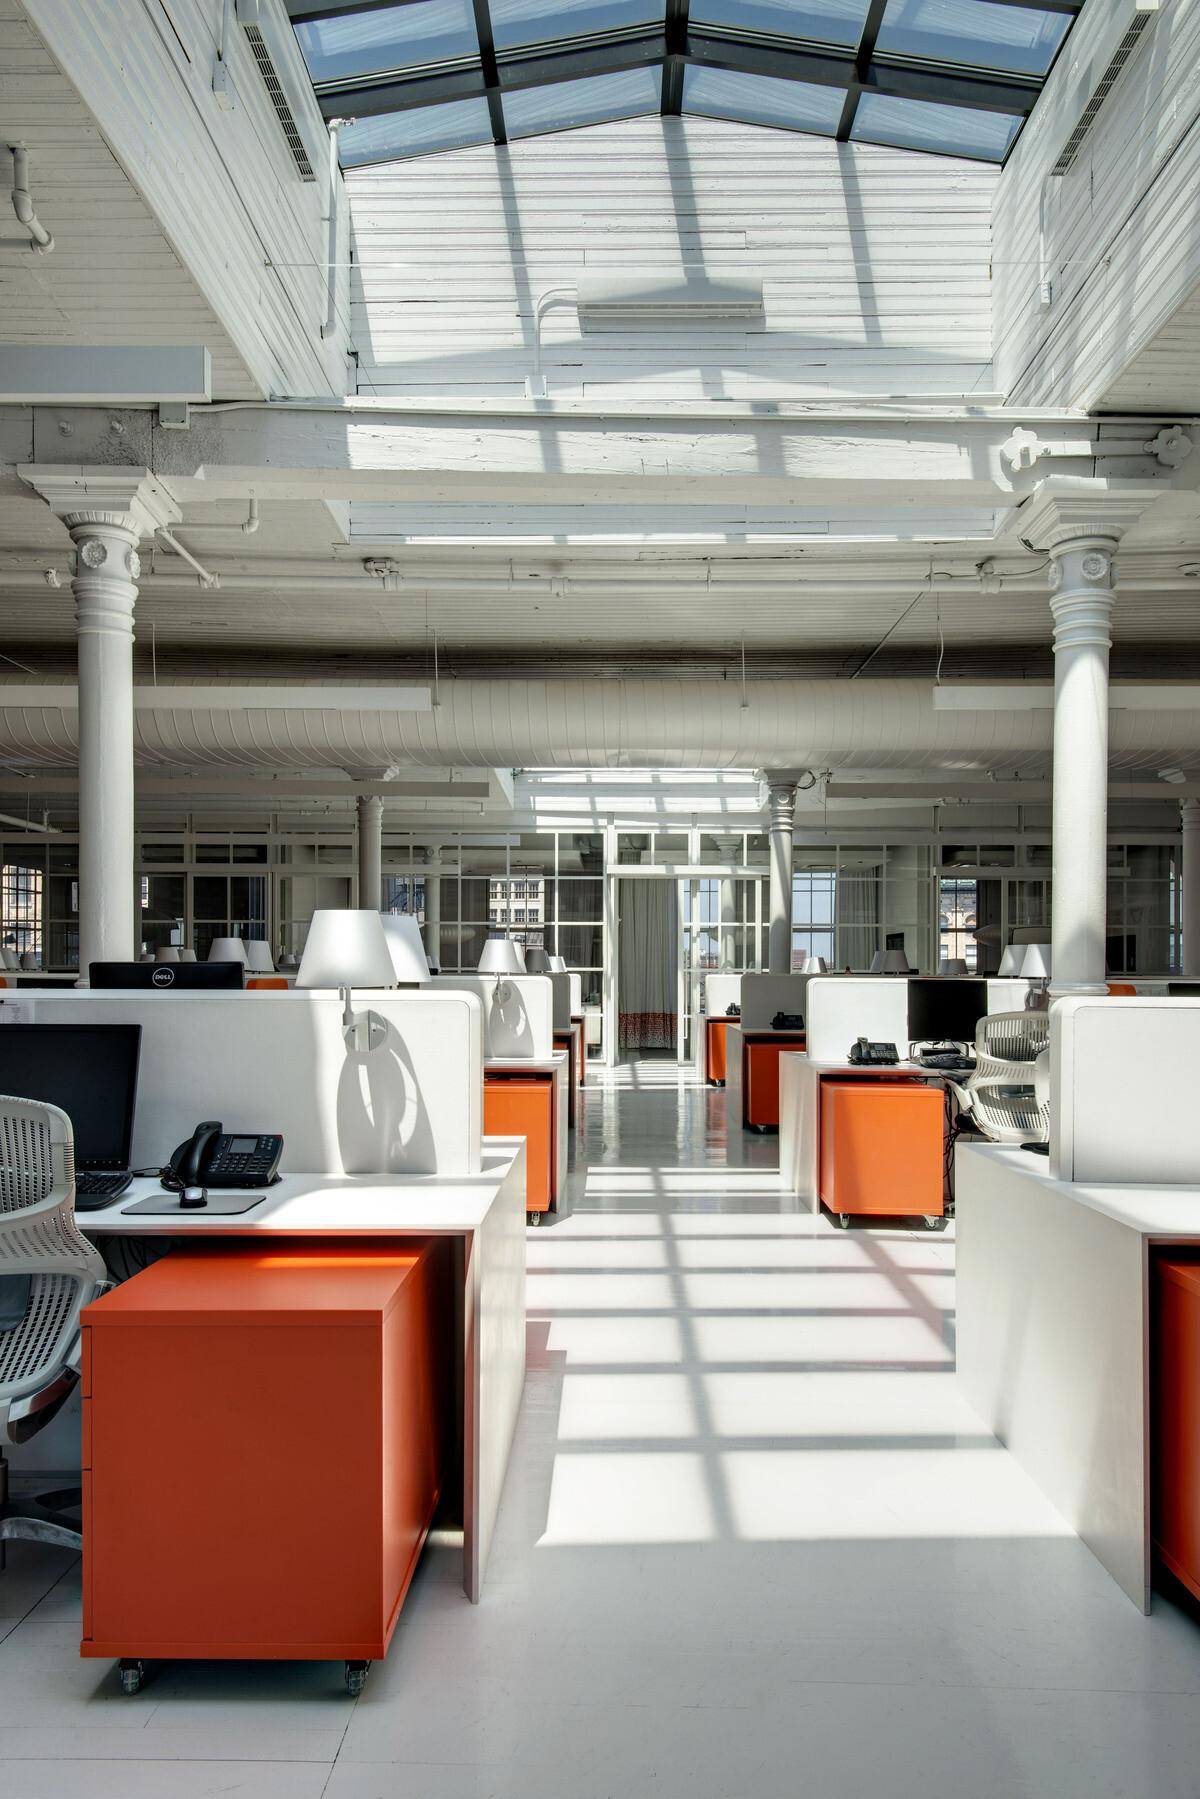 Old attic converted into modern office BHDM Design - HomeWorldDesign (6)